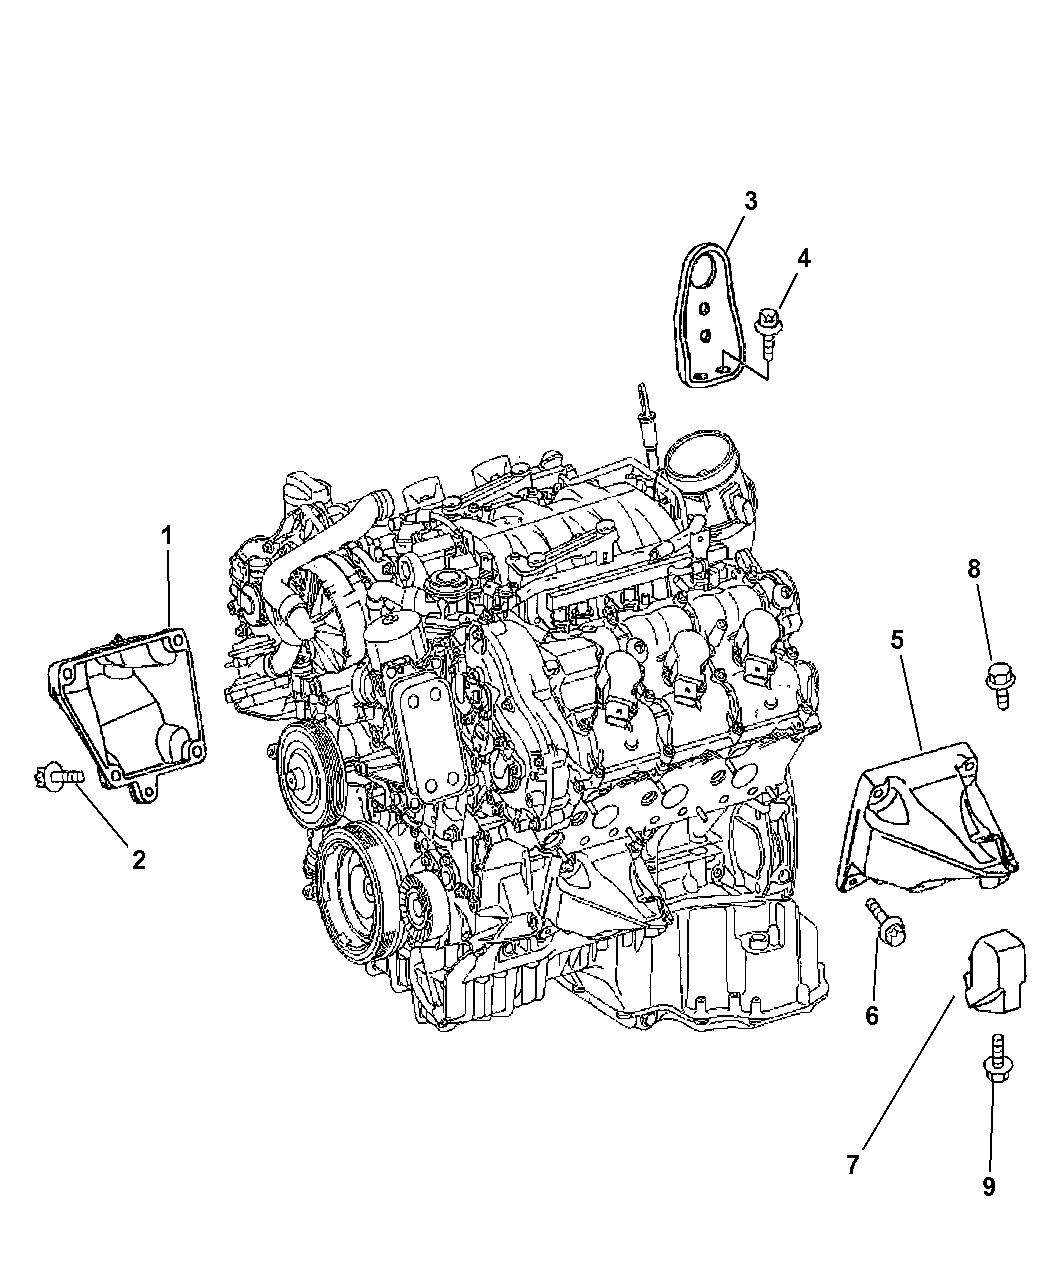 Dodge Sprinter Engine Diagram   rob-nature wiring diagram -  rob-nature.ilcasaledelbarone.itilcasaledelbarone.it